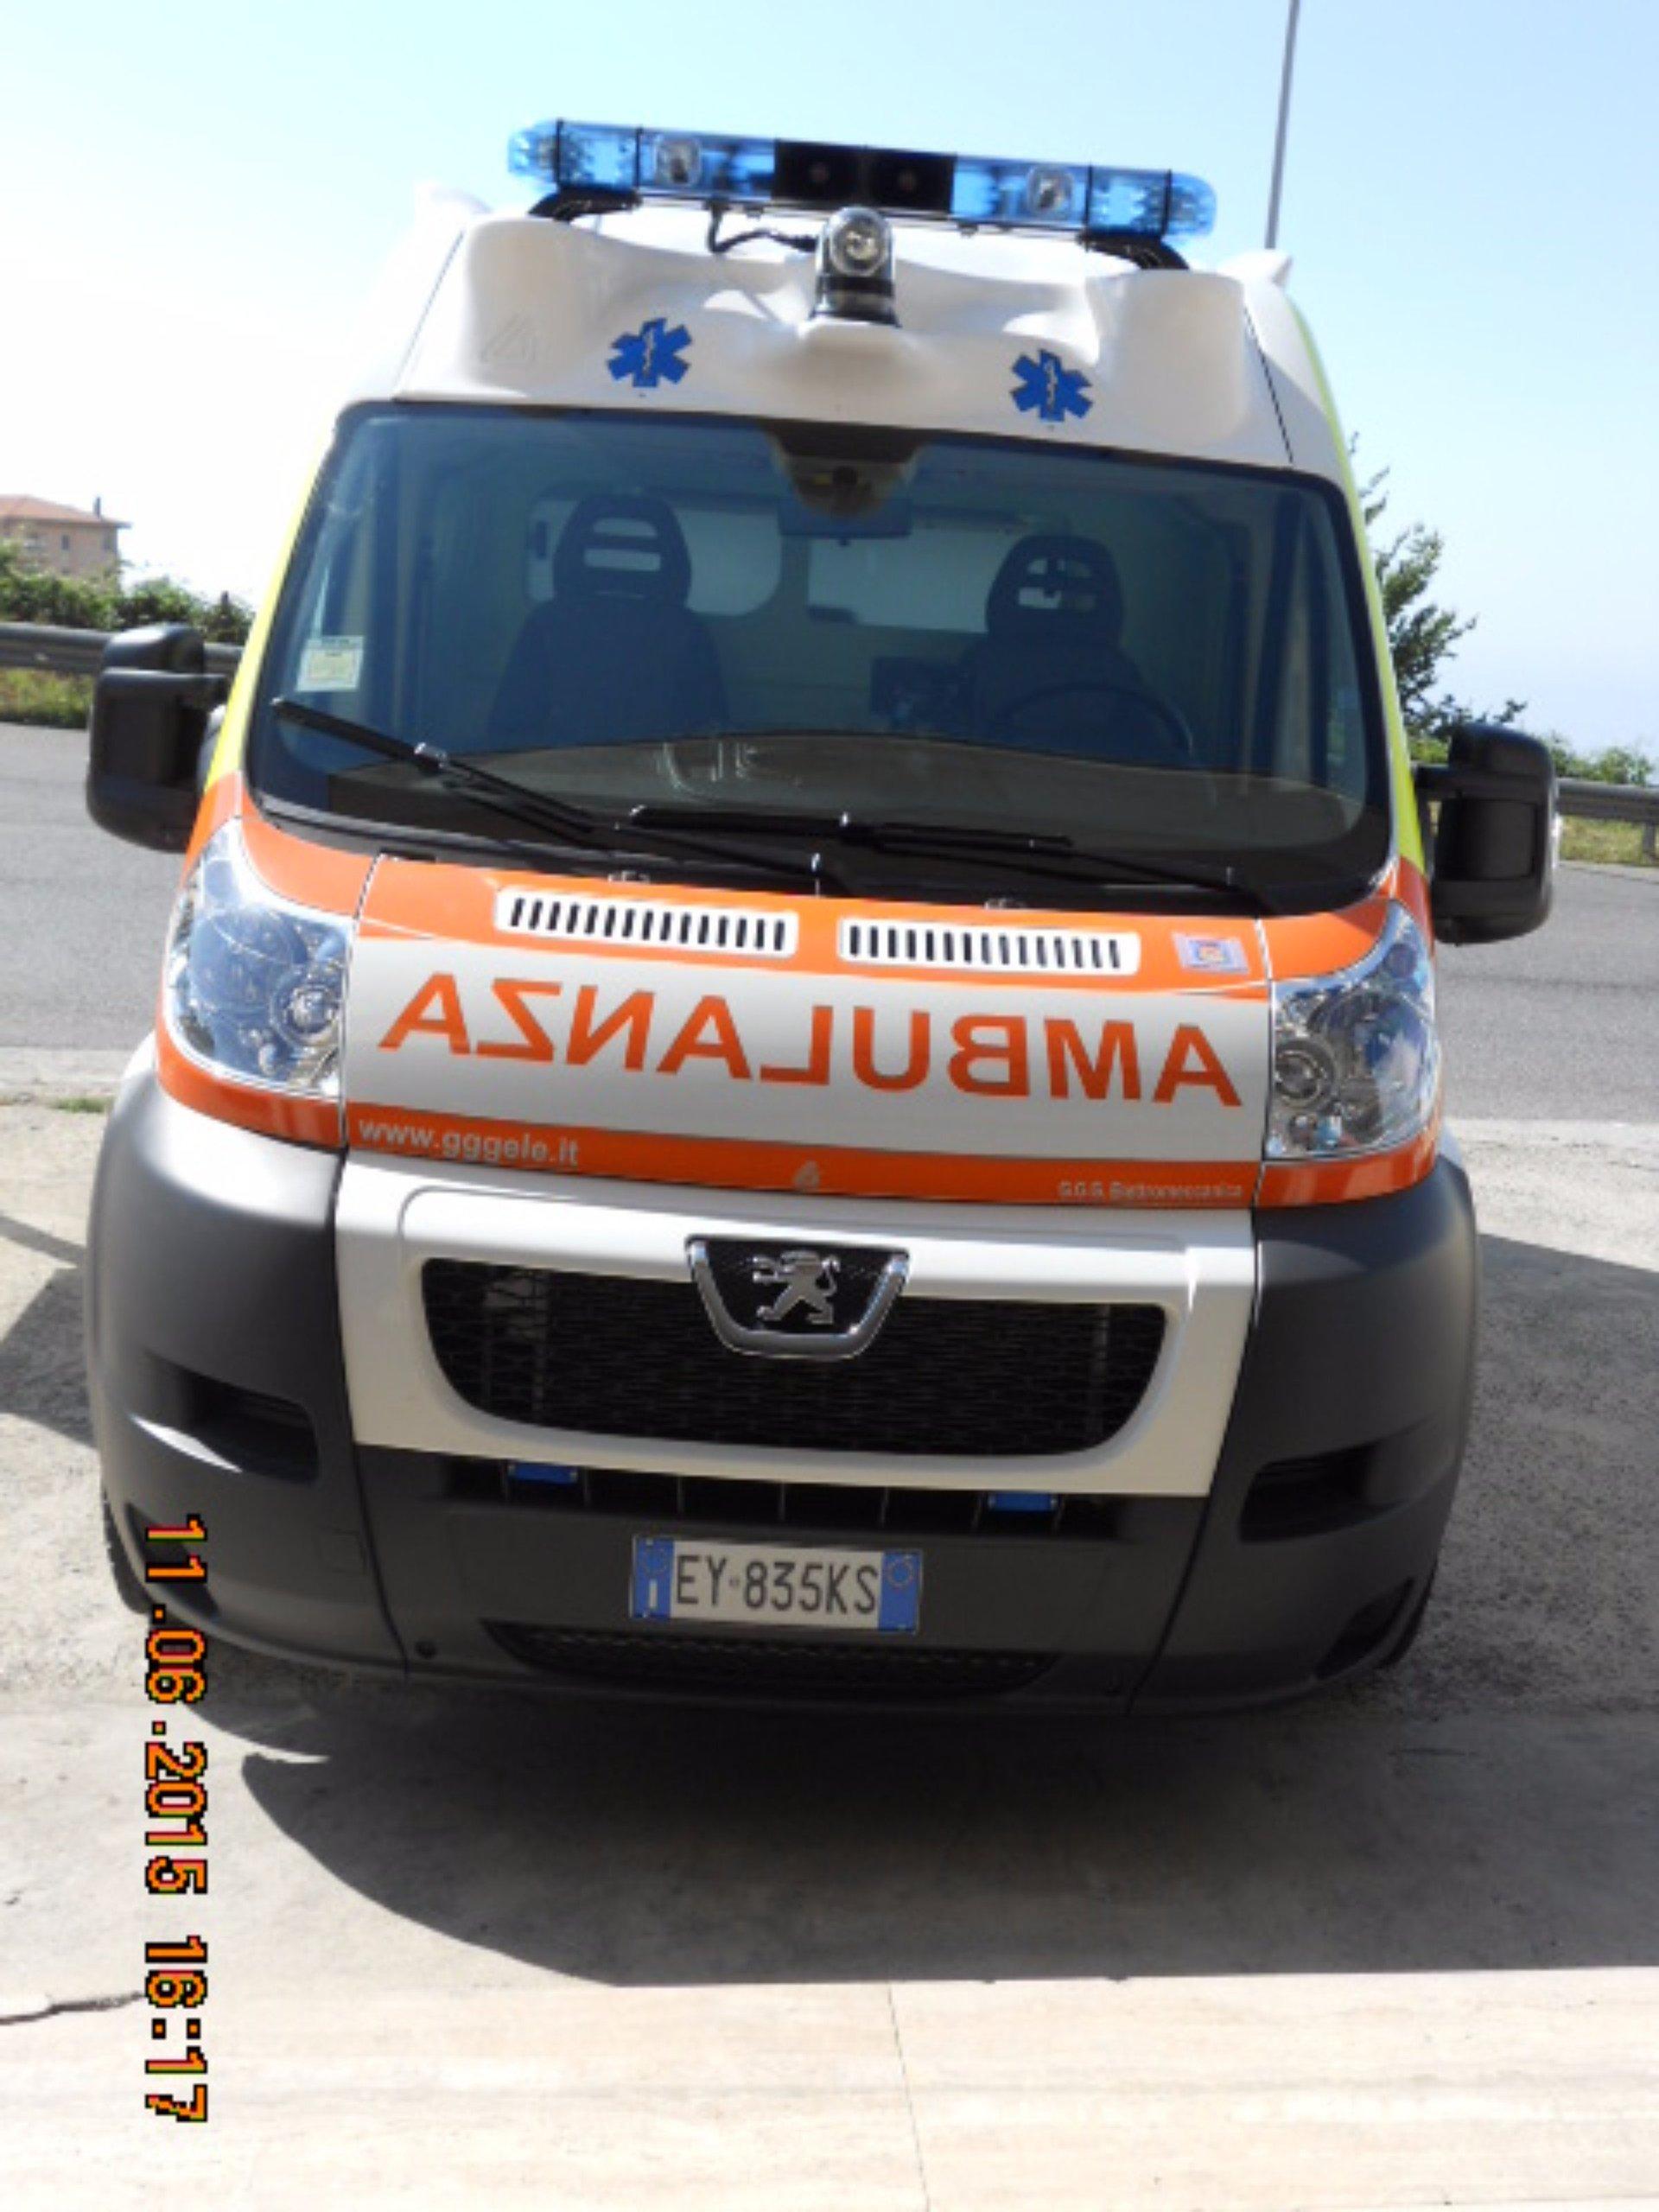 Frontal dell'ambulanza